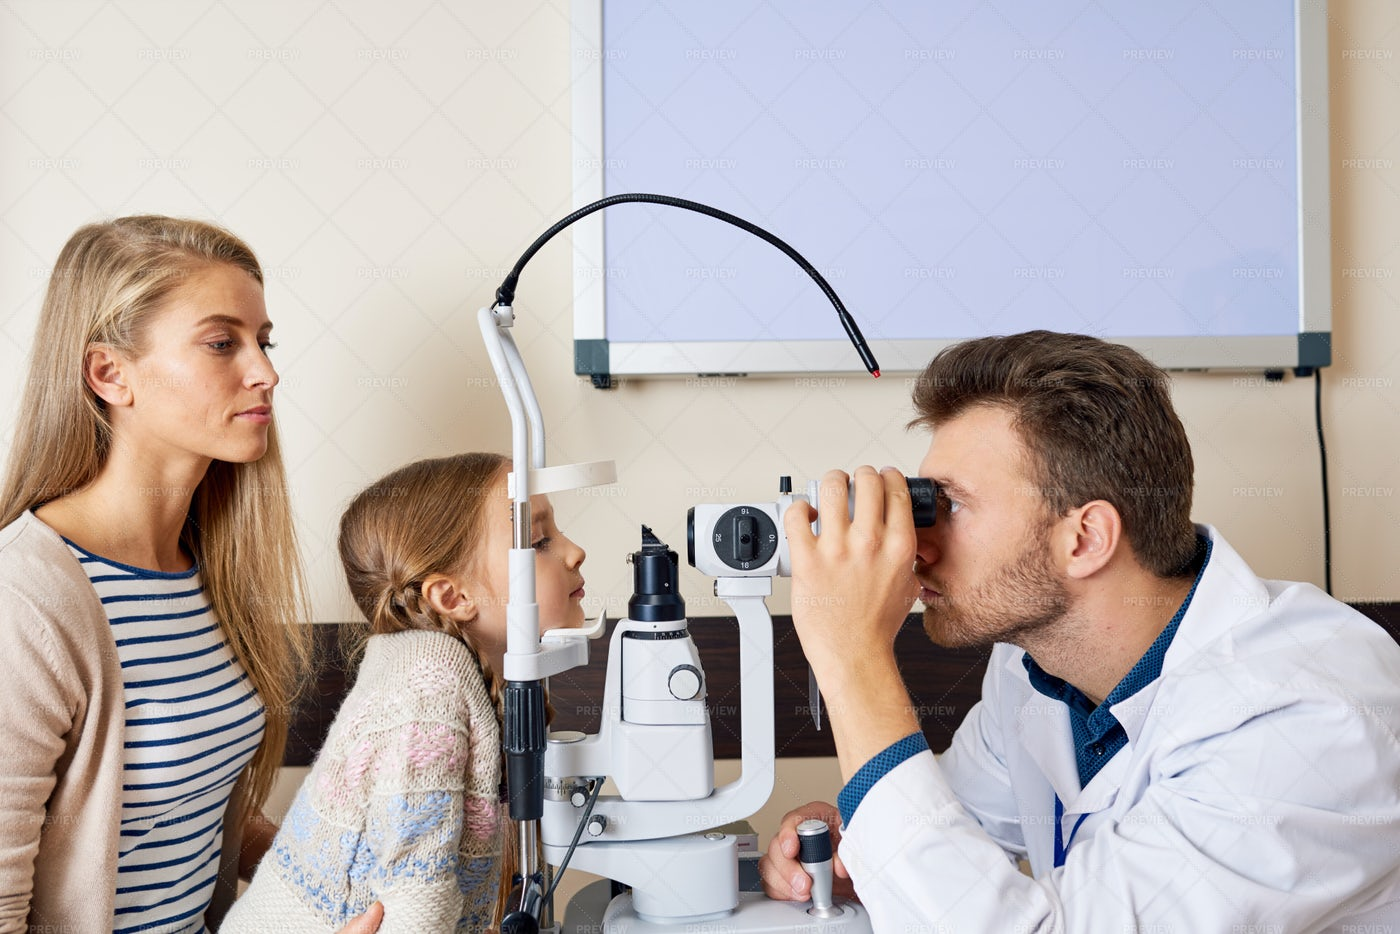 Little Girl At Eye Testing...: Stock Photos